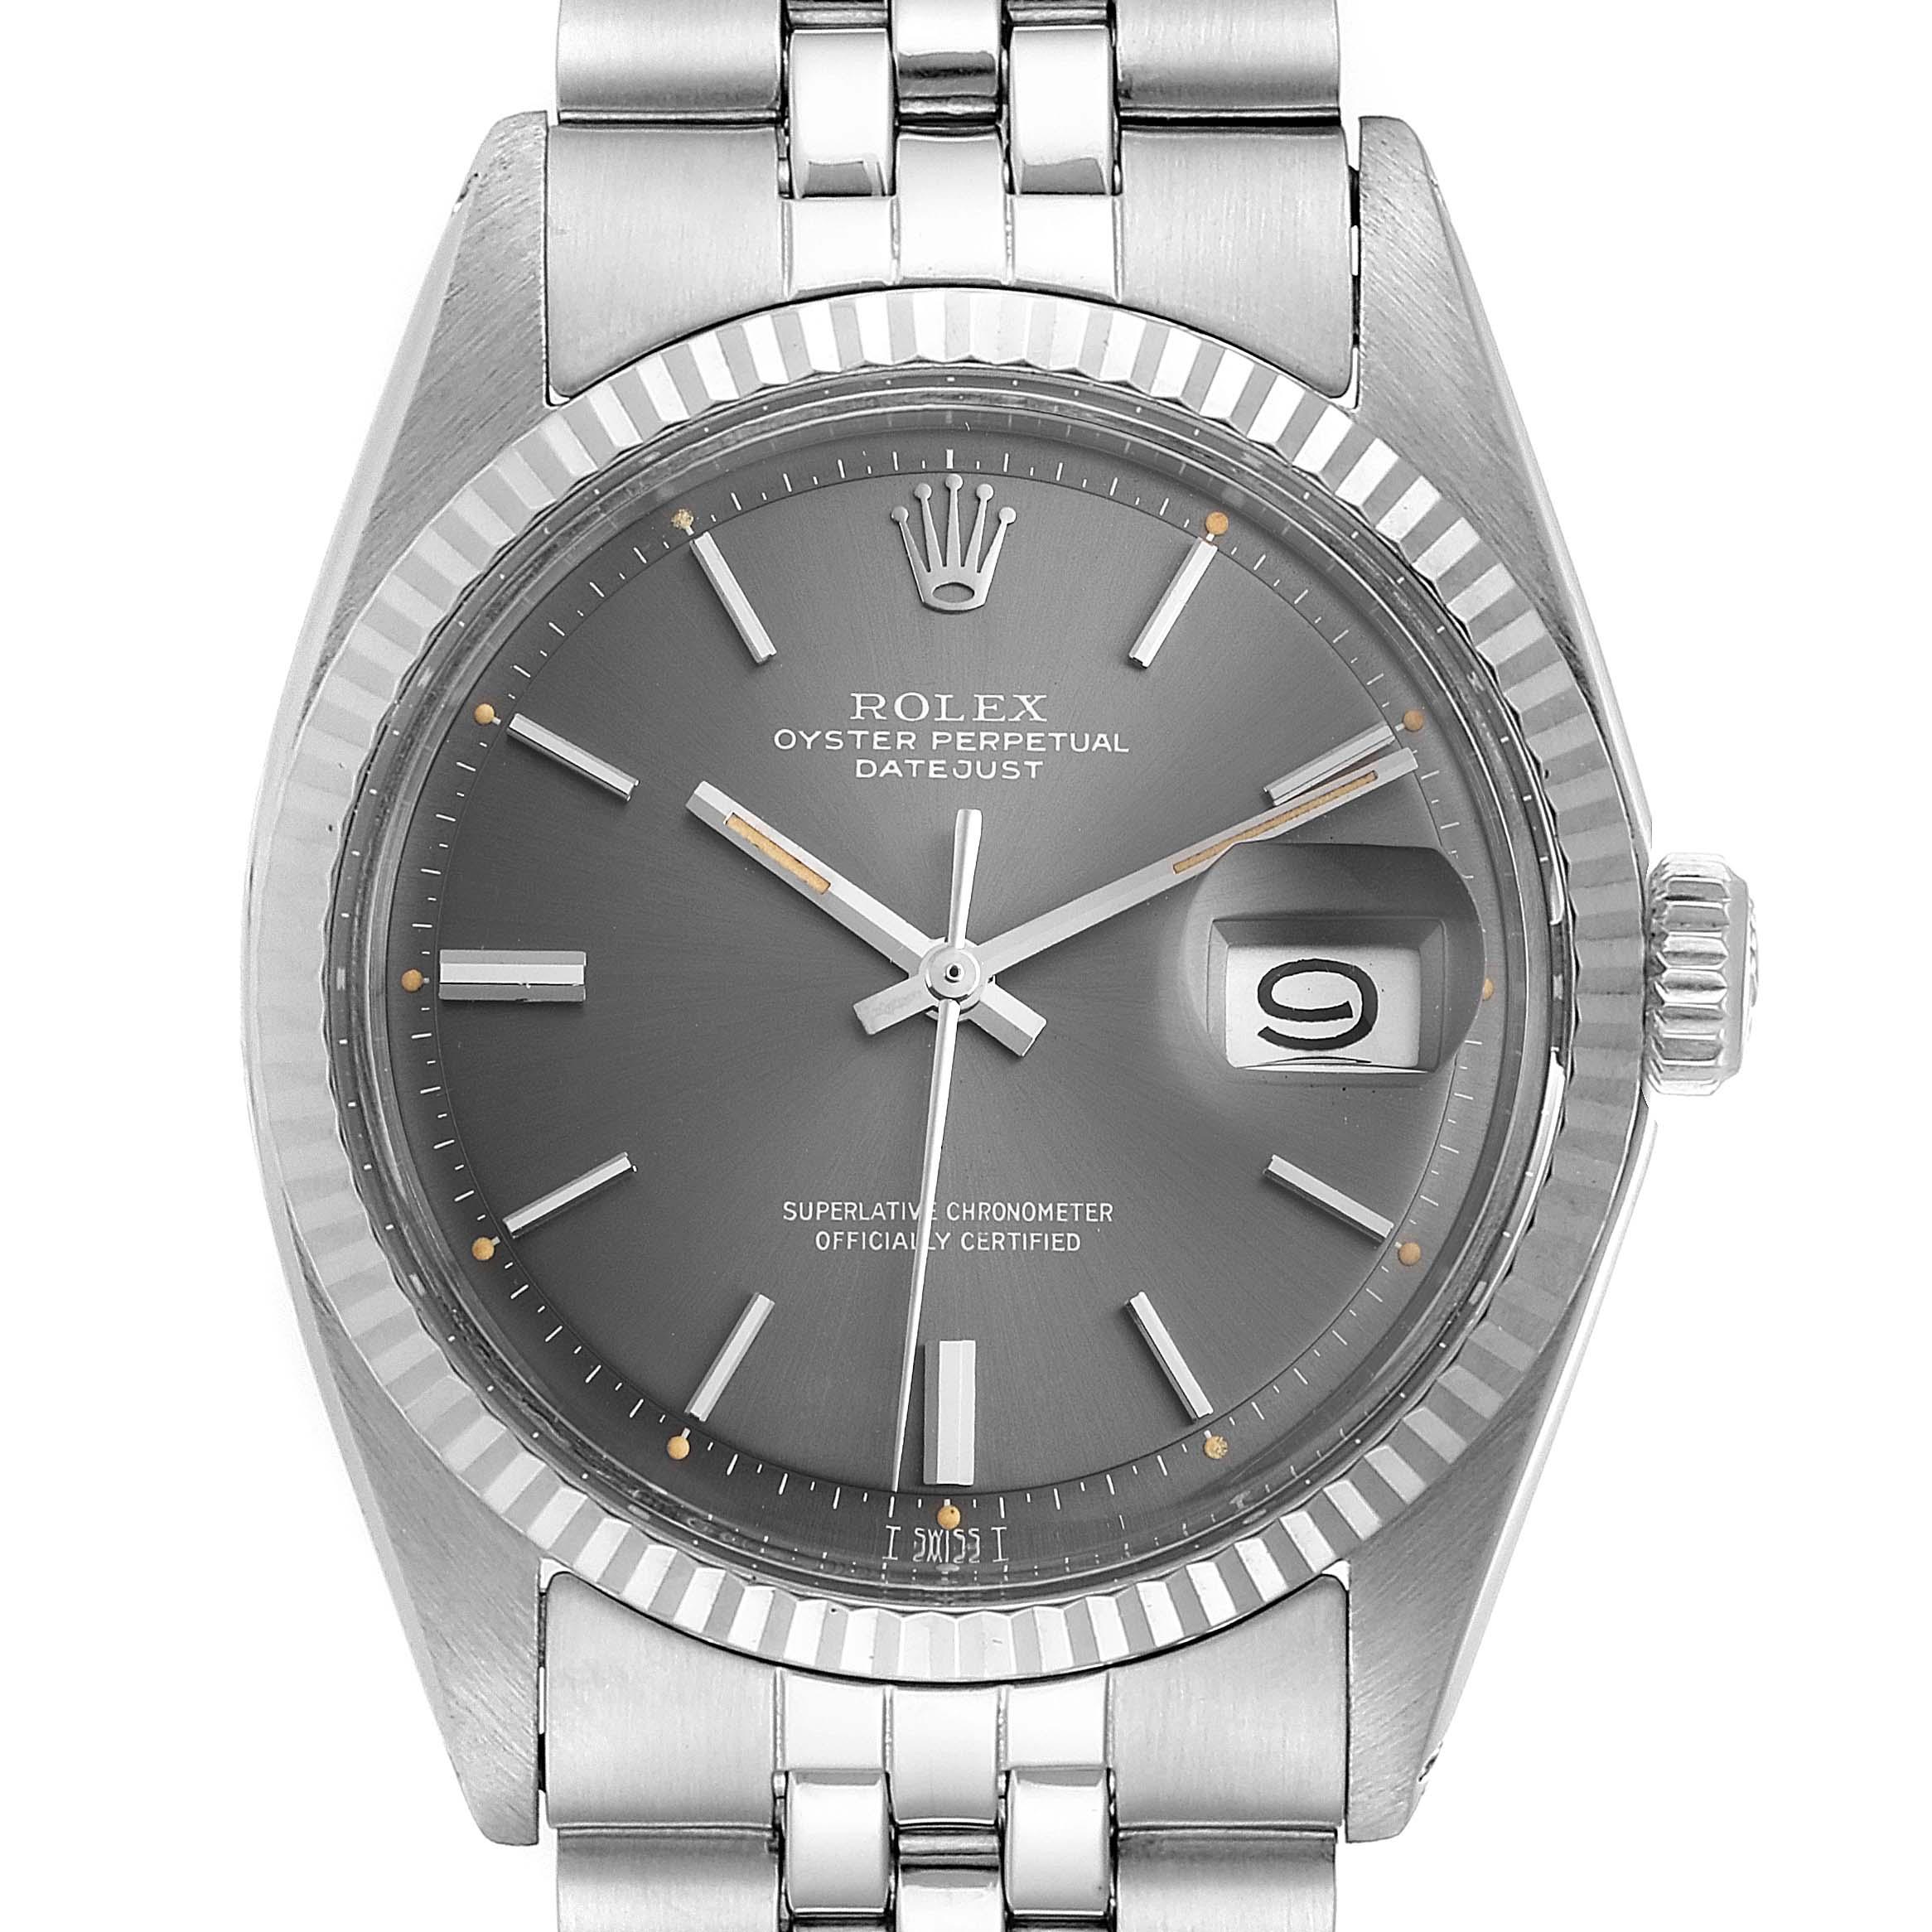 Photo of Rolex Datejust Steel White Gold Grey Dial Vintage Steel Watch 1601